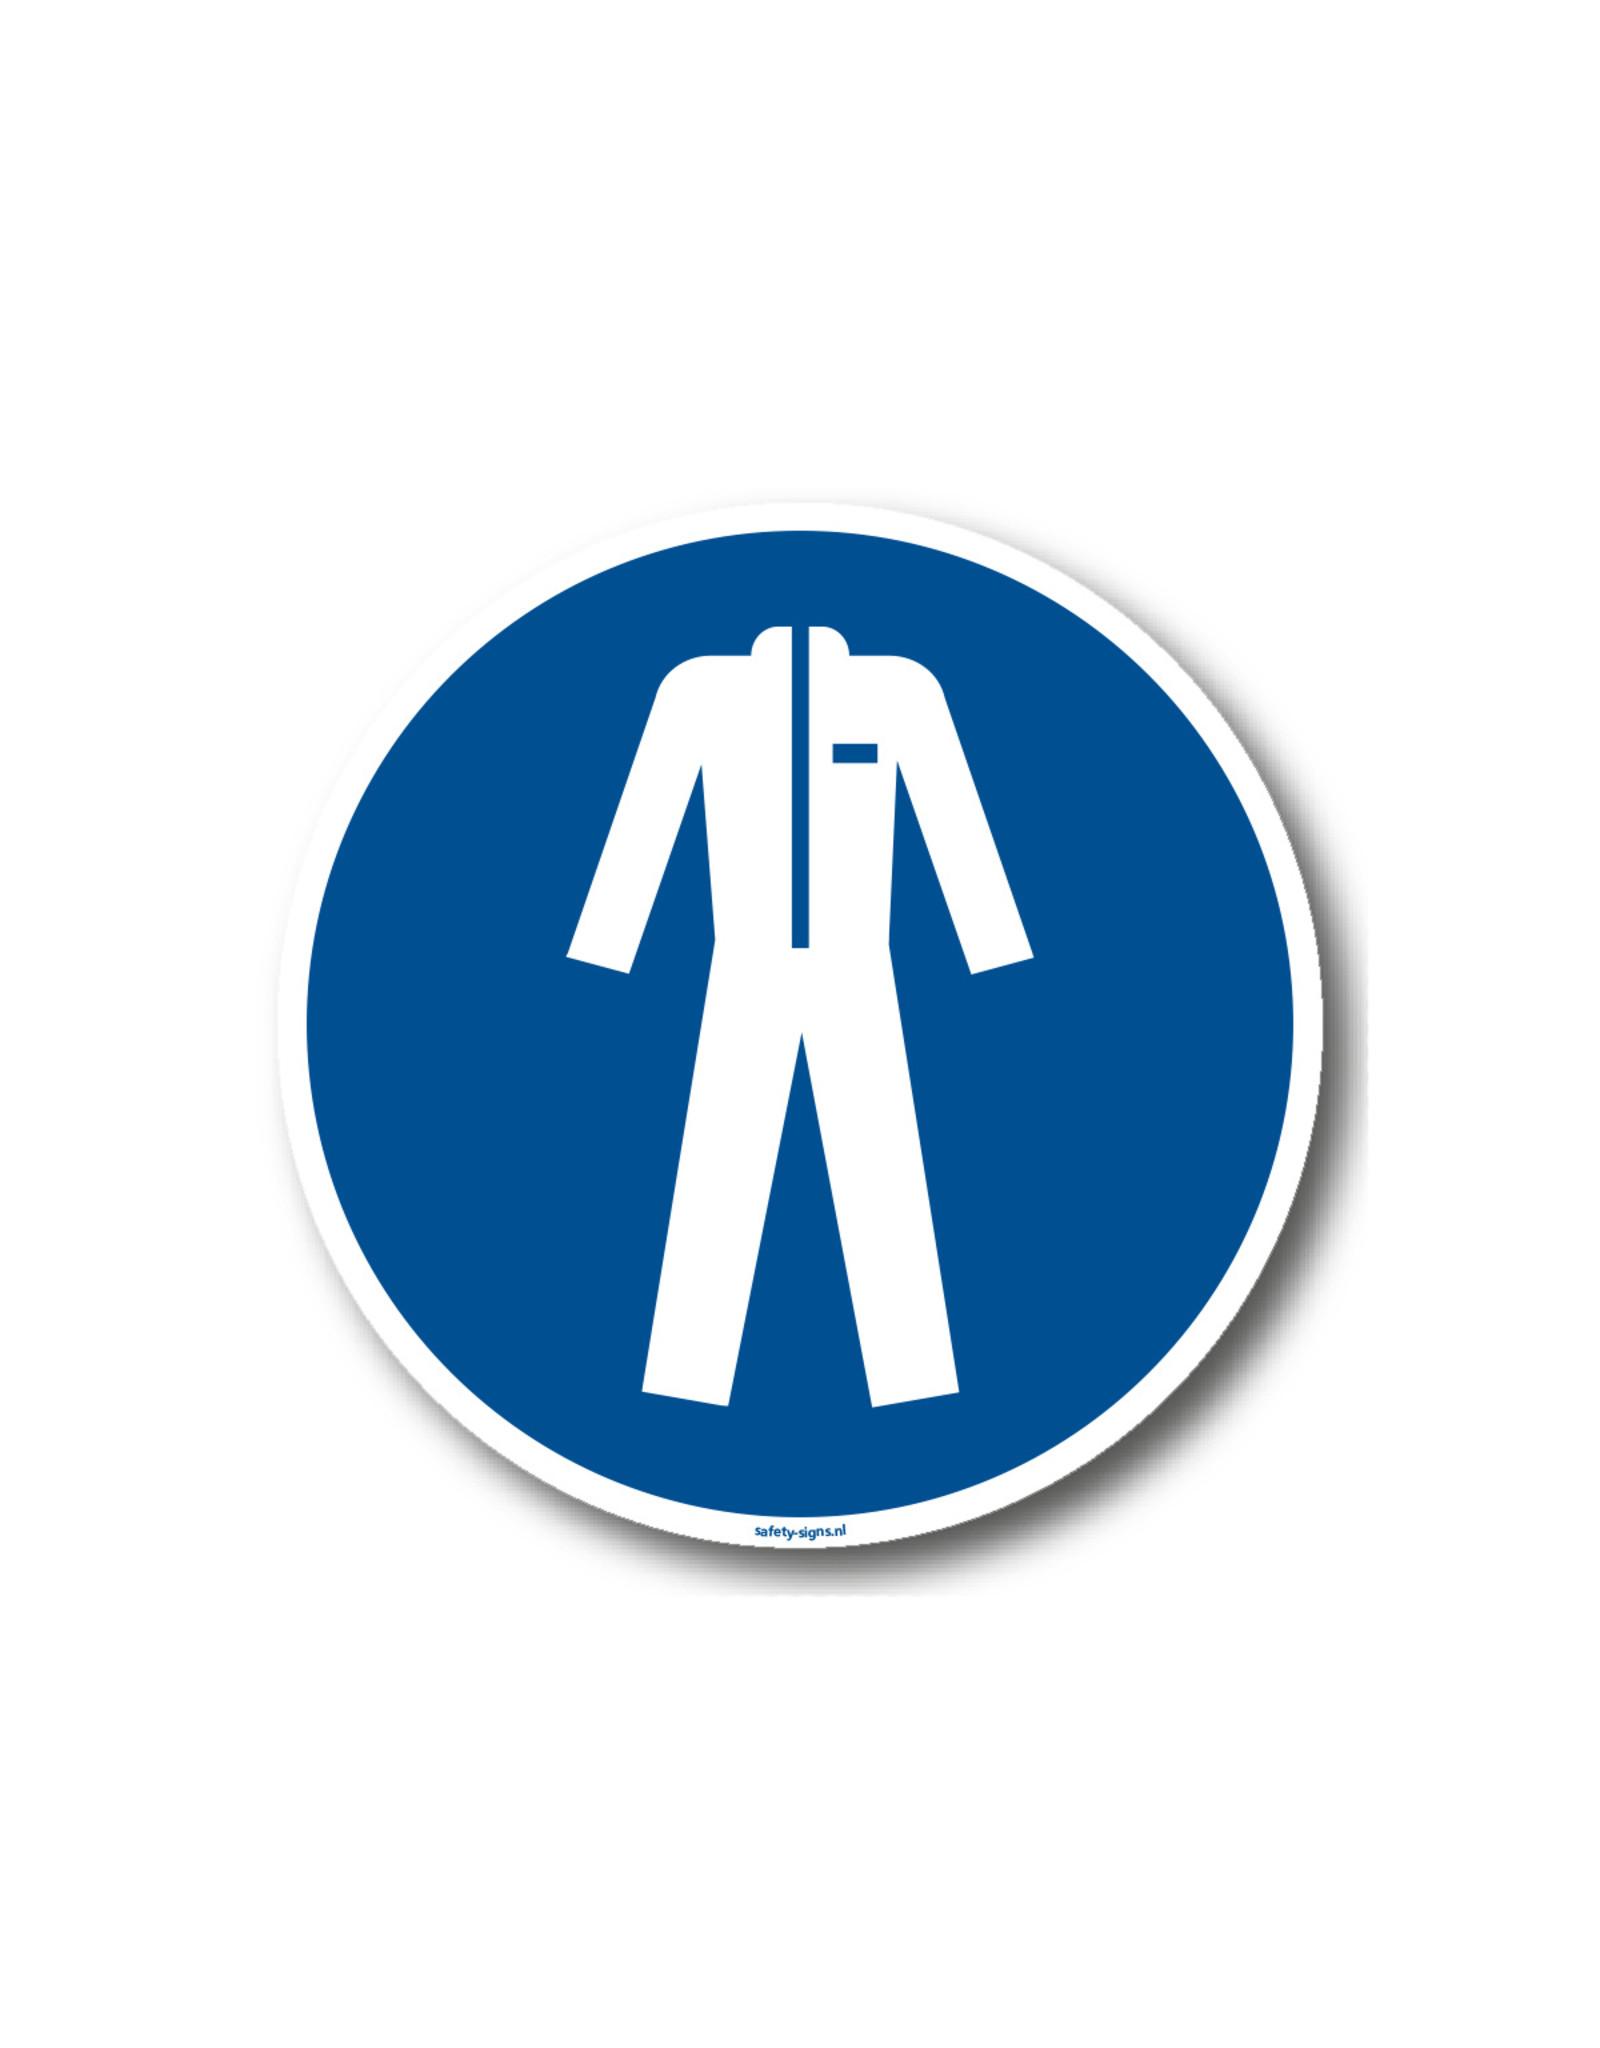 BrouwerSign Gebod - Dragen van beschermende kleding verplicht